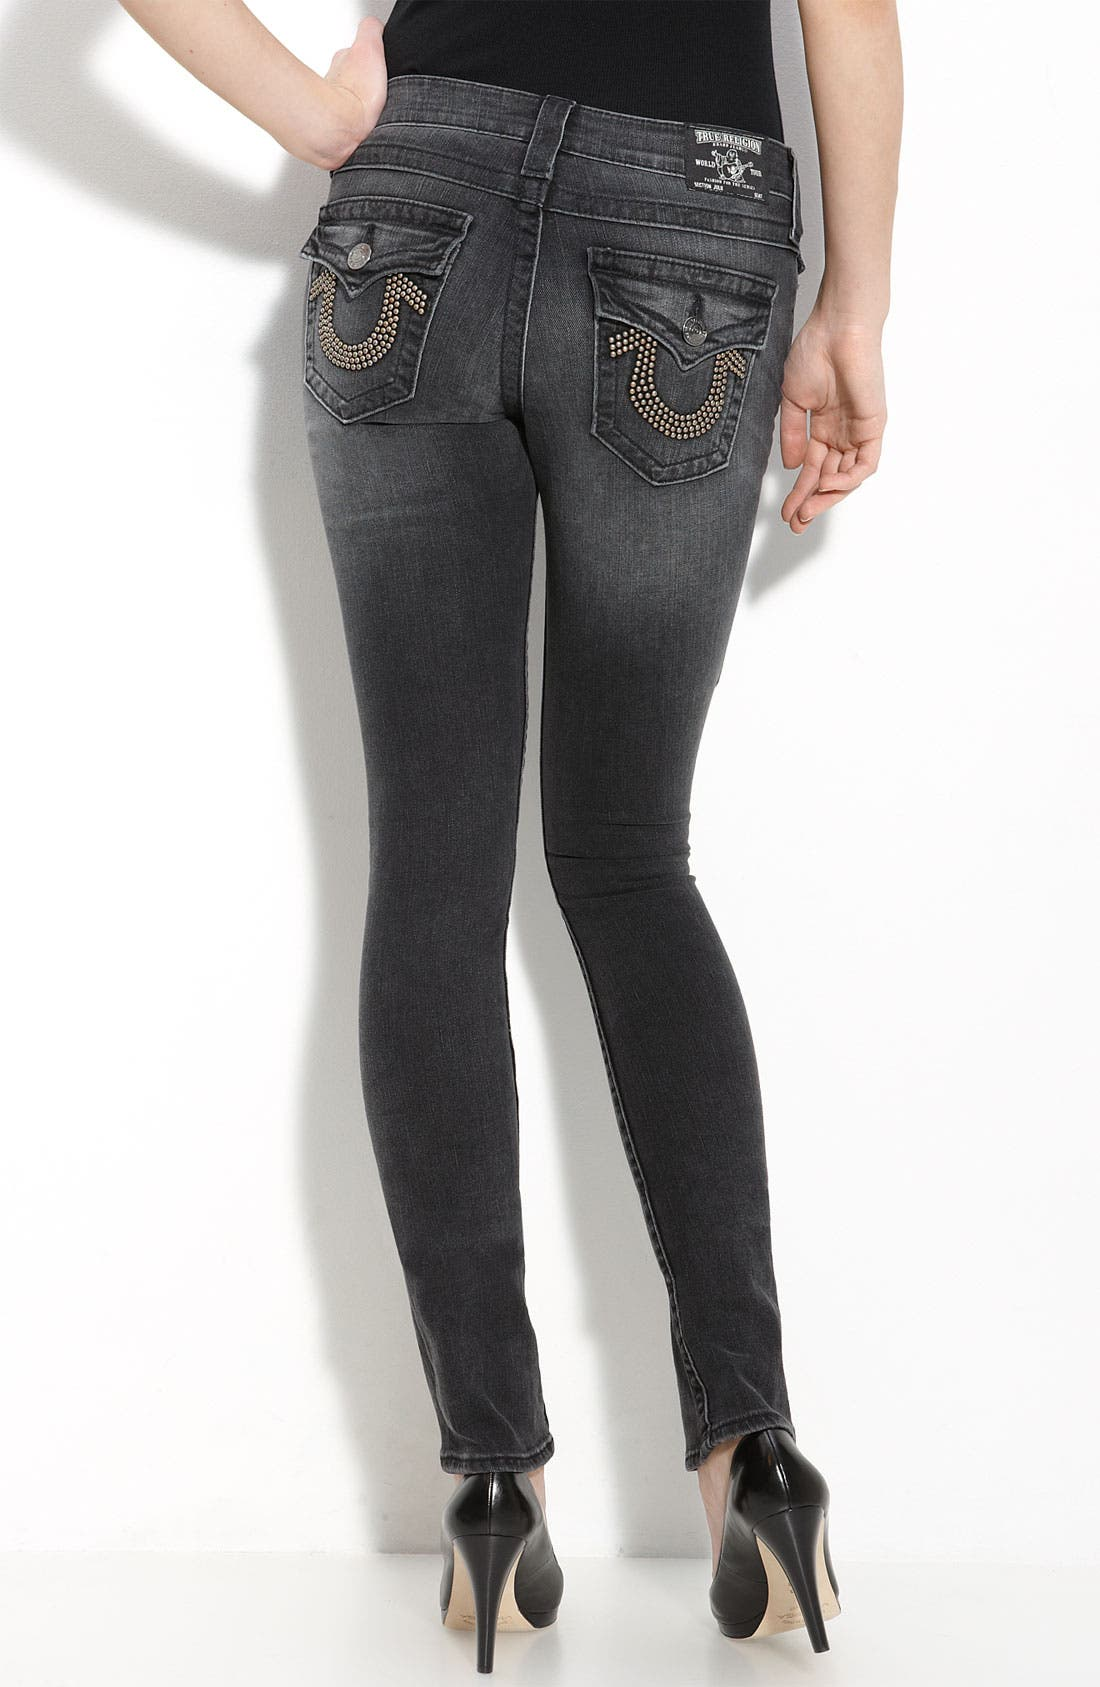 Main Image - True Religion Brand Jeans 'Julie' Skinny Stretch Jeans (Short Fuse Wash)